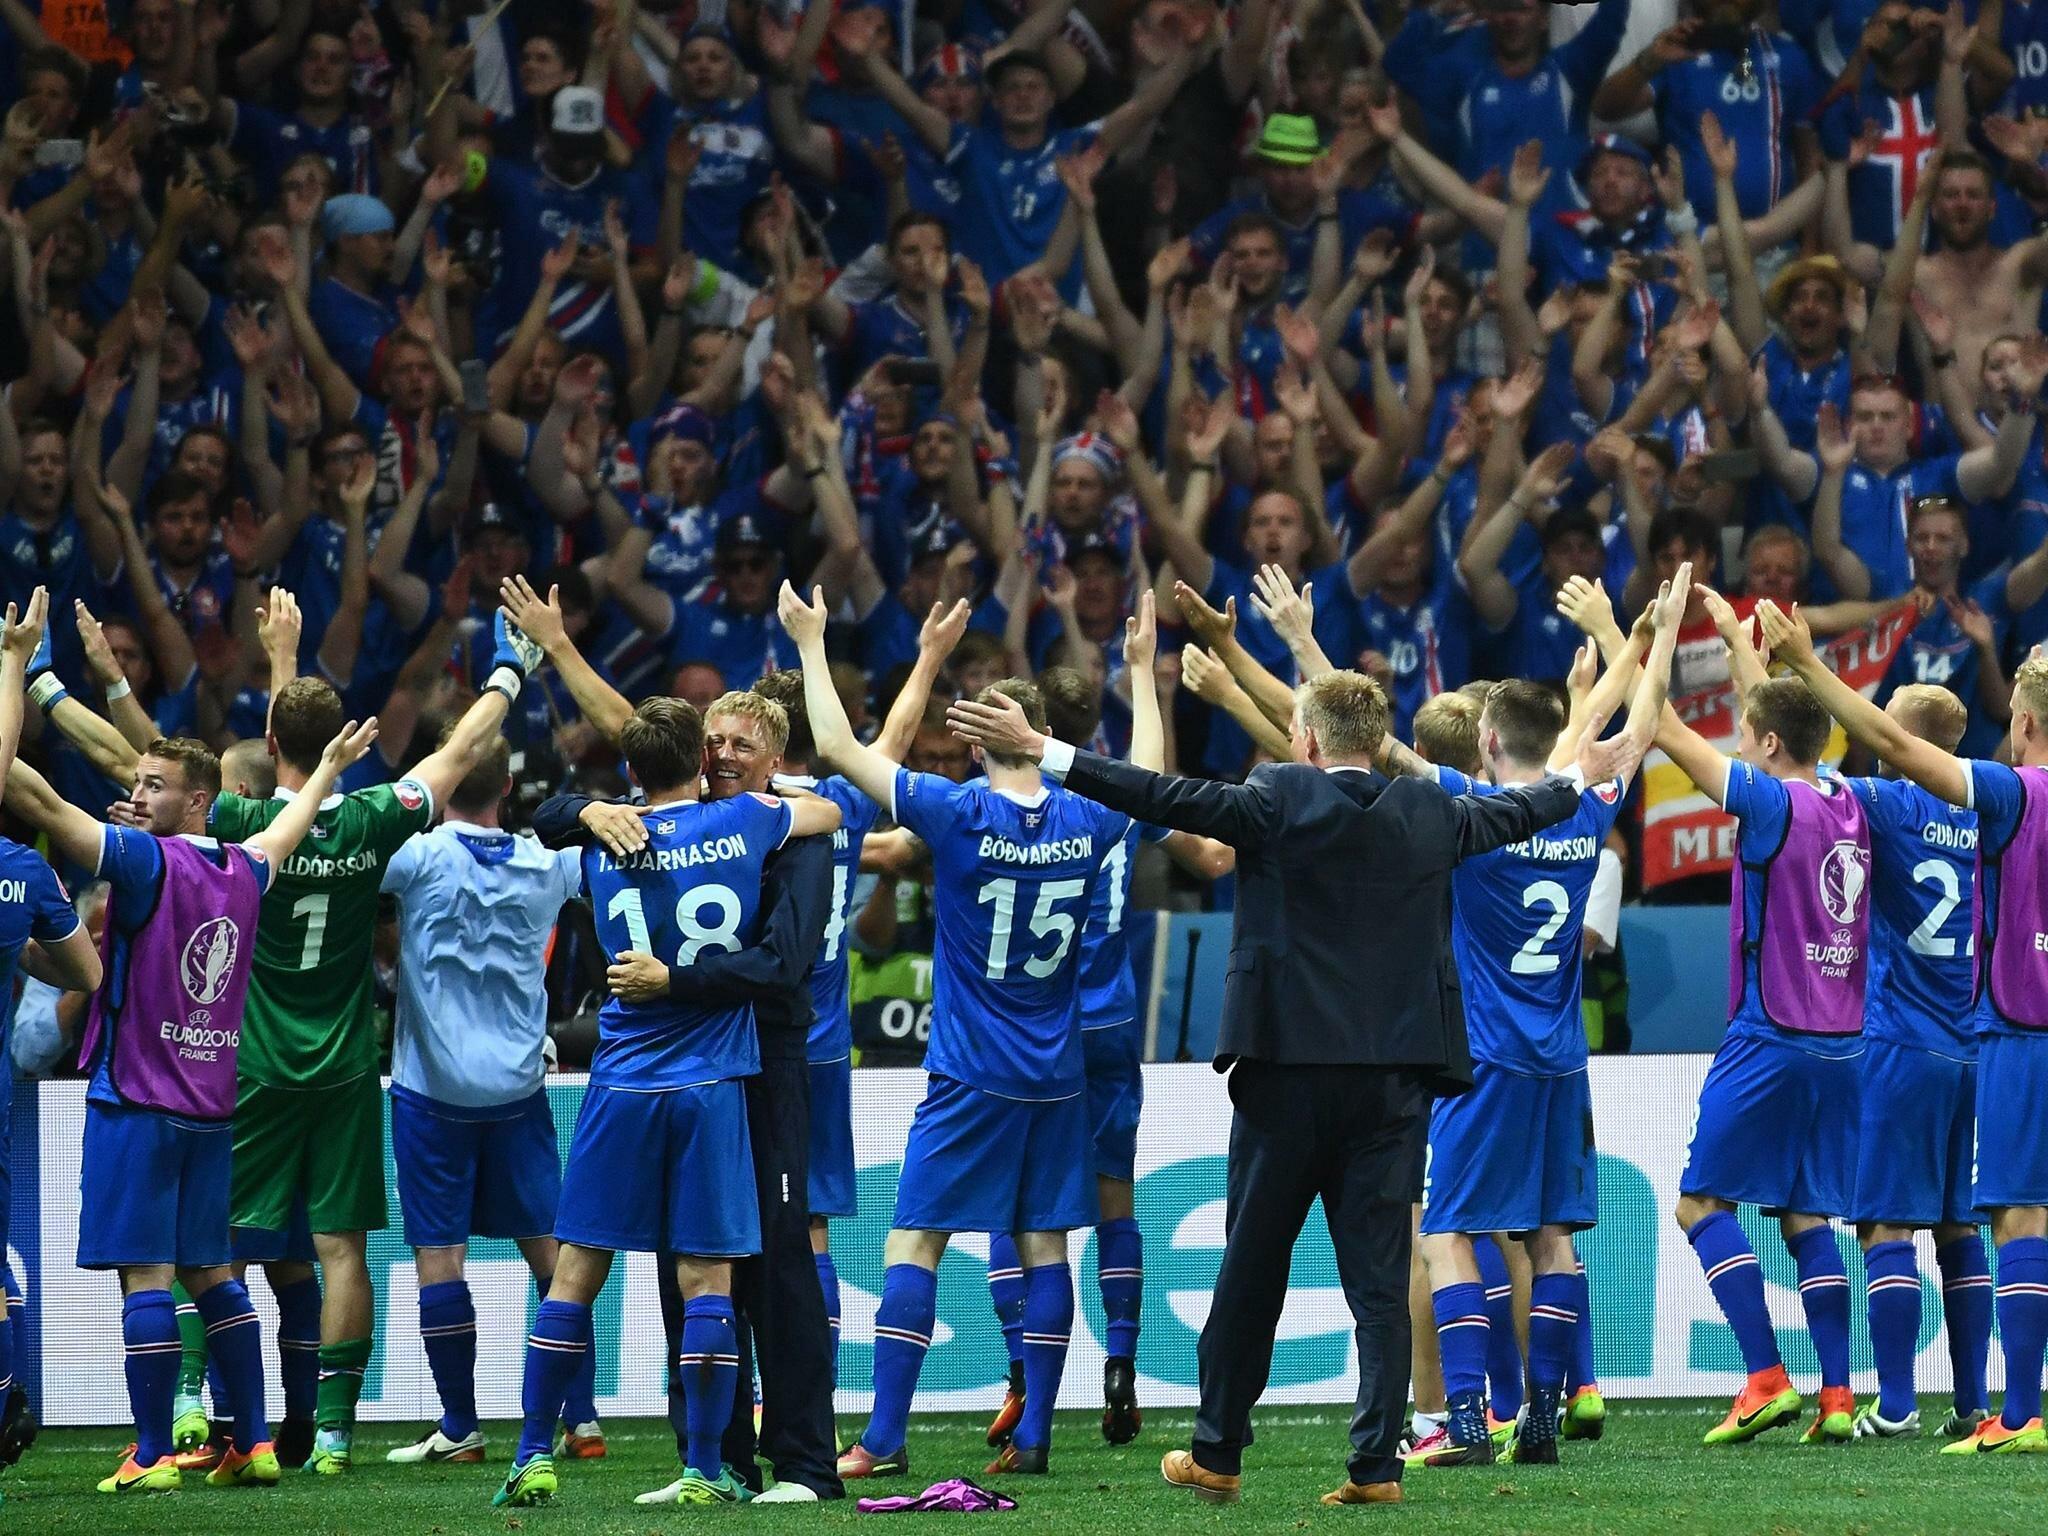 Спустя 9 месяцев после Евро вИсландии установлен рекорд рождаемости